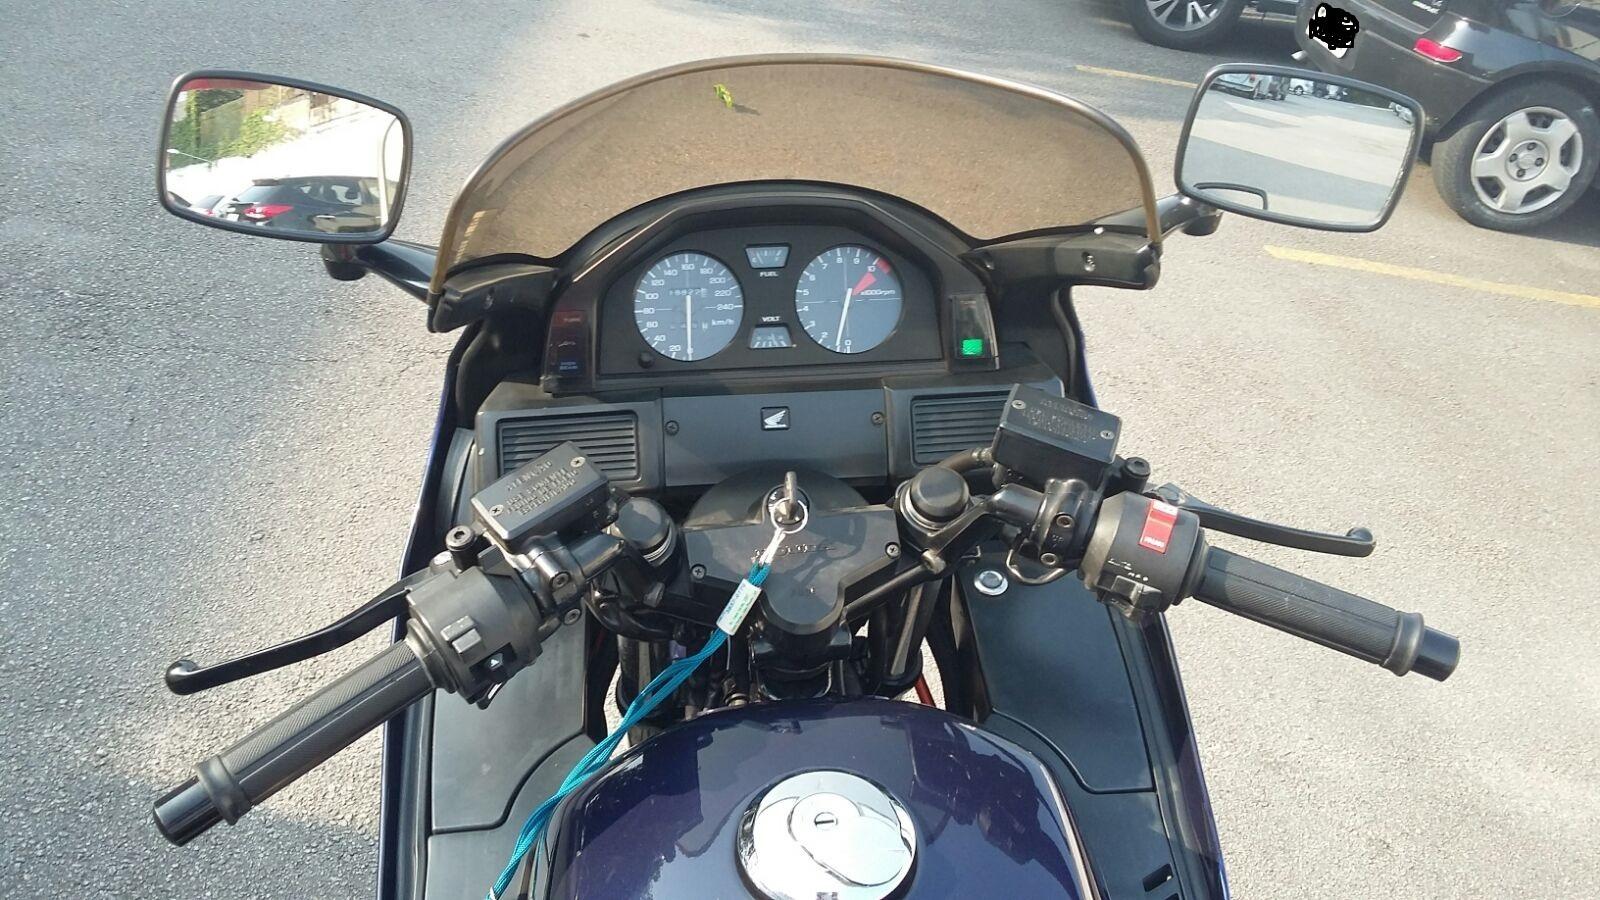 [VENDIDA] CBX 750 Indy 95 Único Dono I750k4